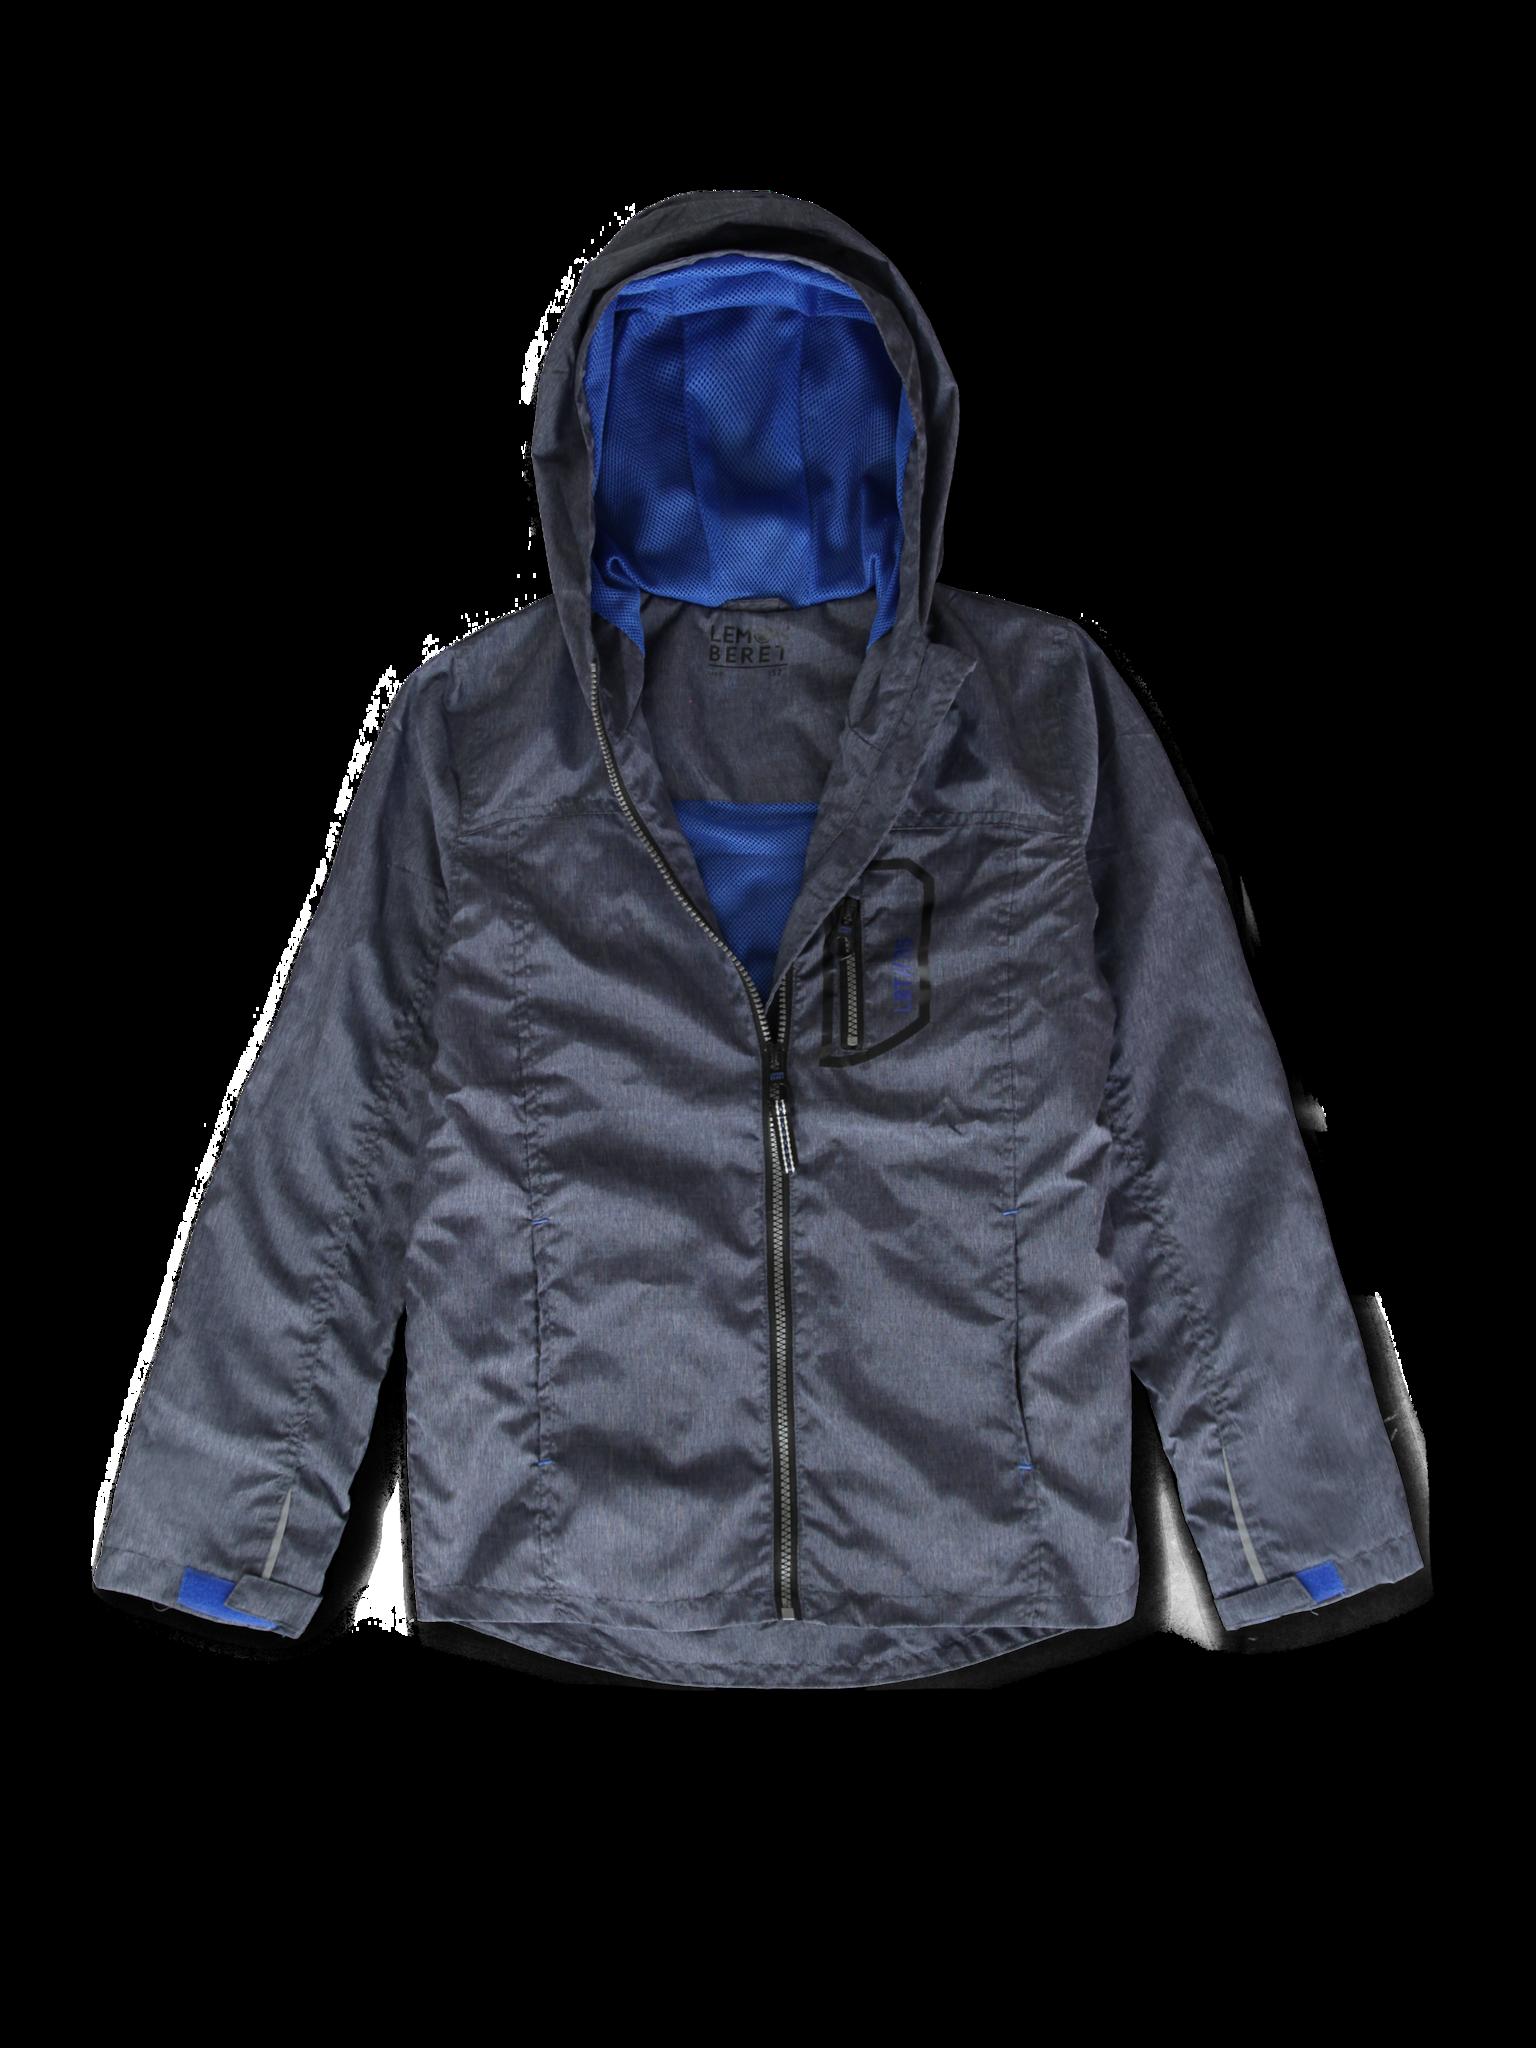 All Brands | Summerproducts Teen Boys | Jacket | 10 pcs/box